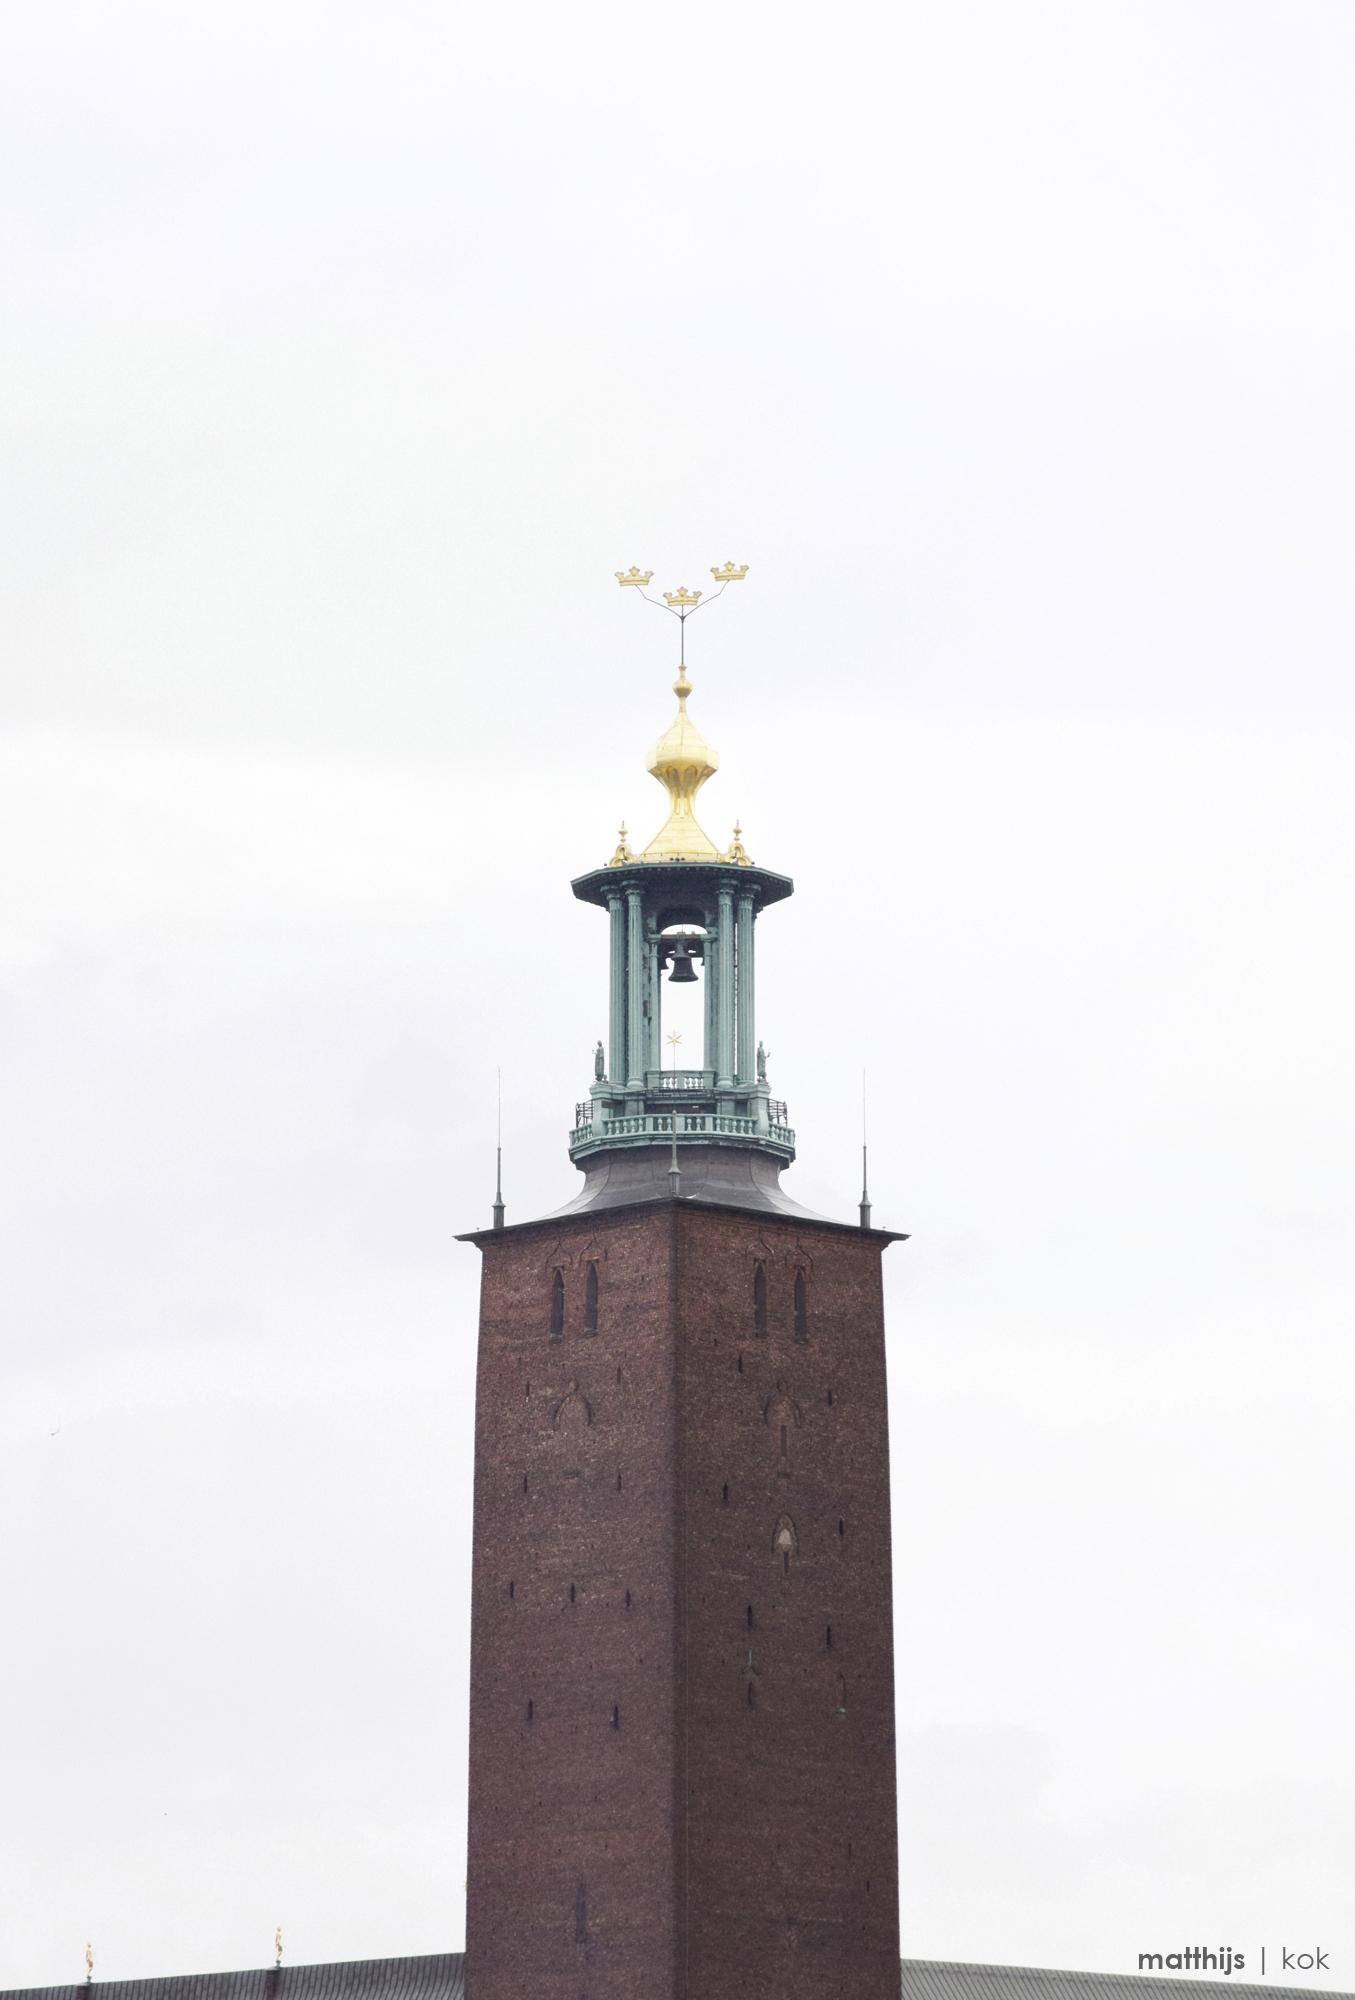 Stockholm City Hall, Kungsholmen, Sweden | Photo by Matthijs Kok